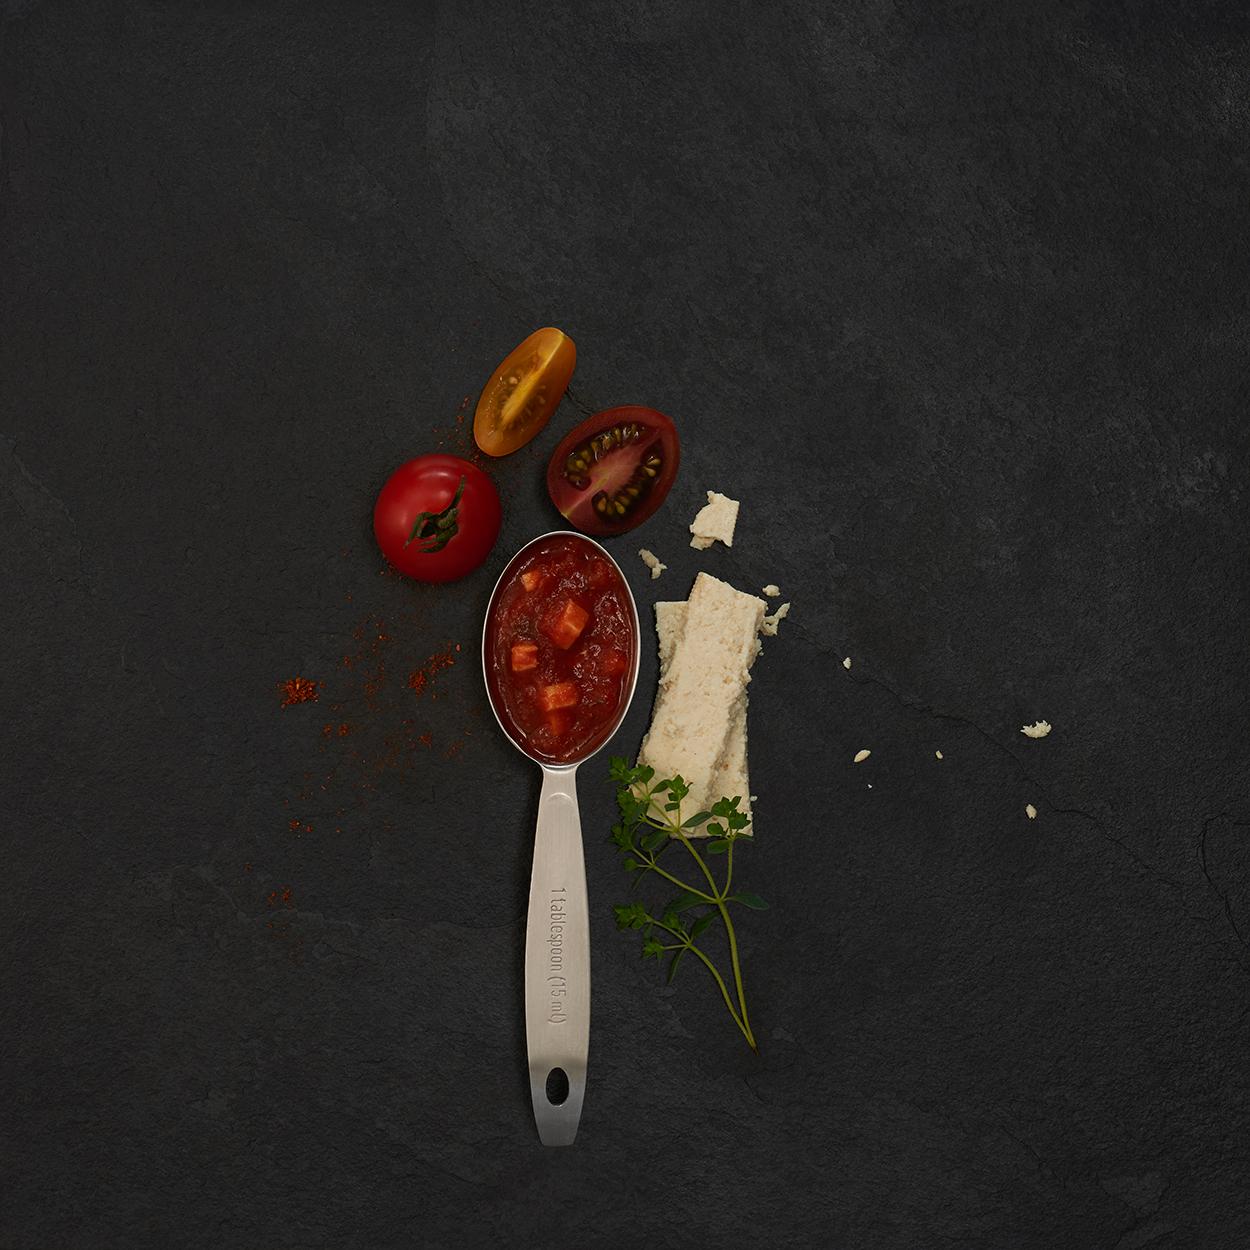 KitchenLab_Orfe_1724418_Tofu_VF copie.jpg